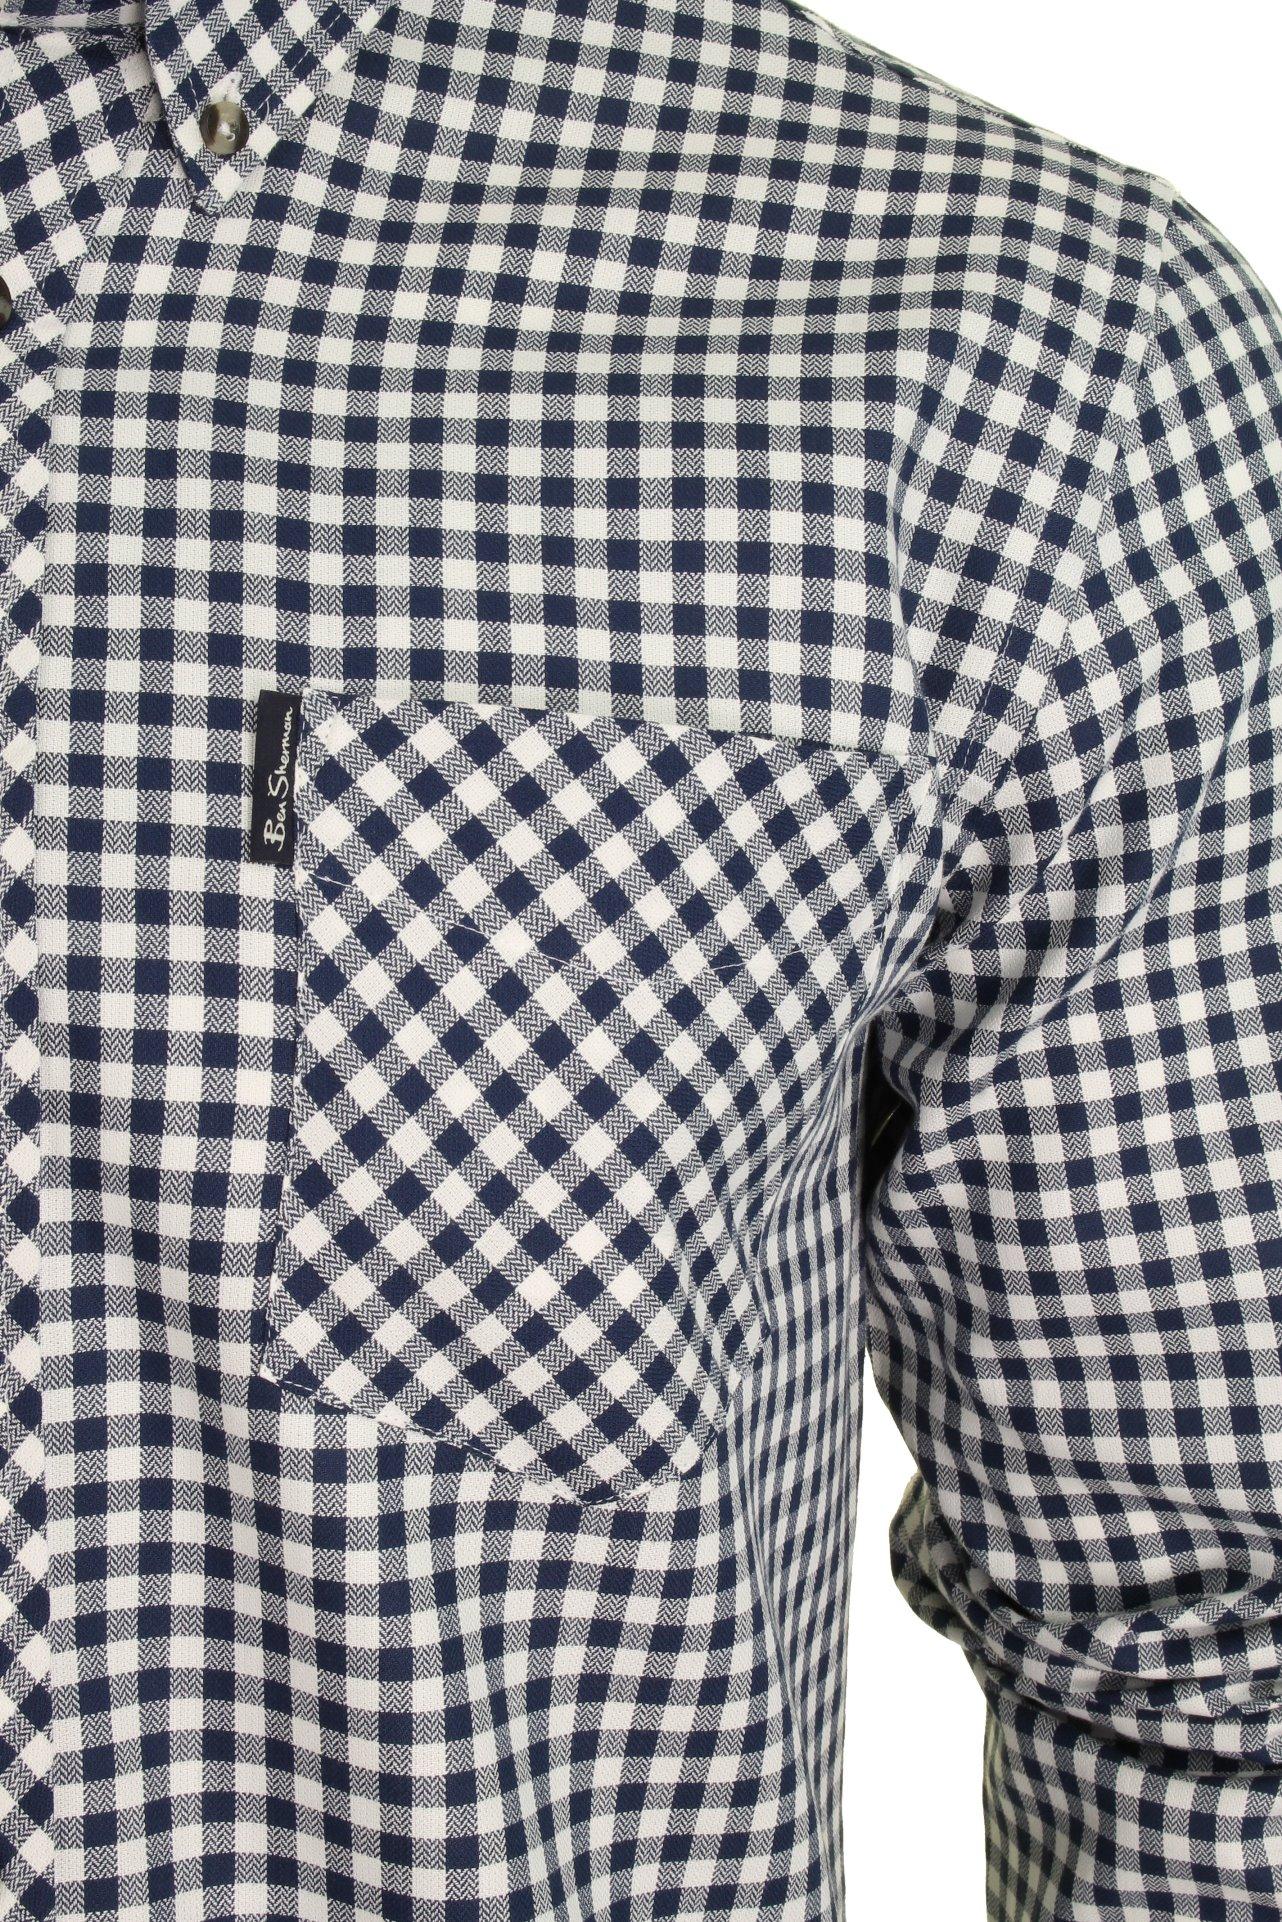 Mens-Ben-Sherman-Long-Sleeved-Shirt-Brushed-Gingham-Check thumbnail 4